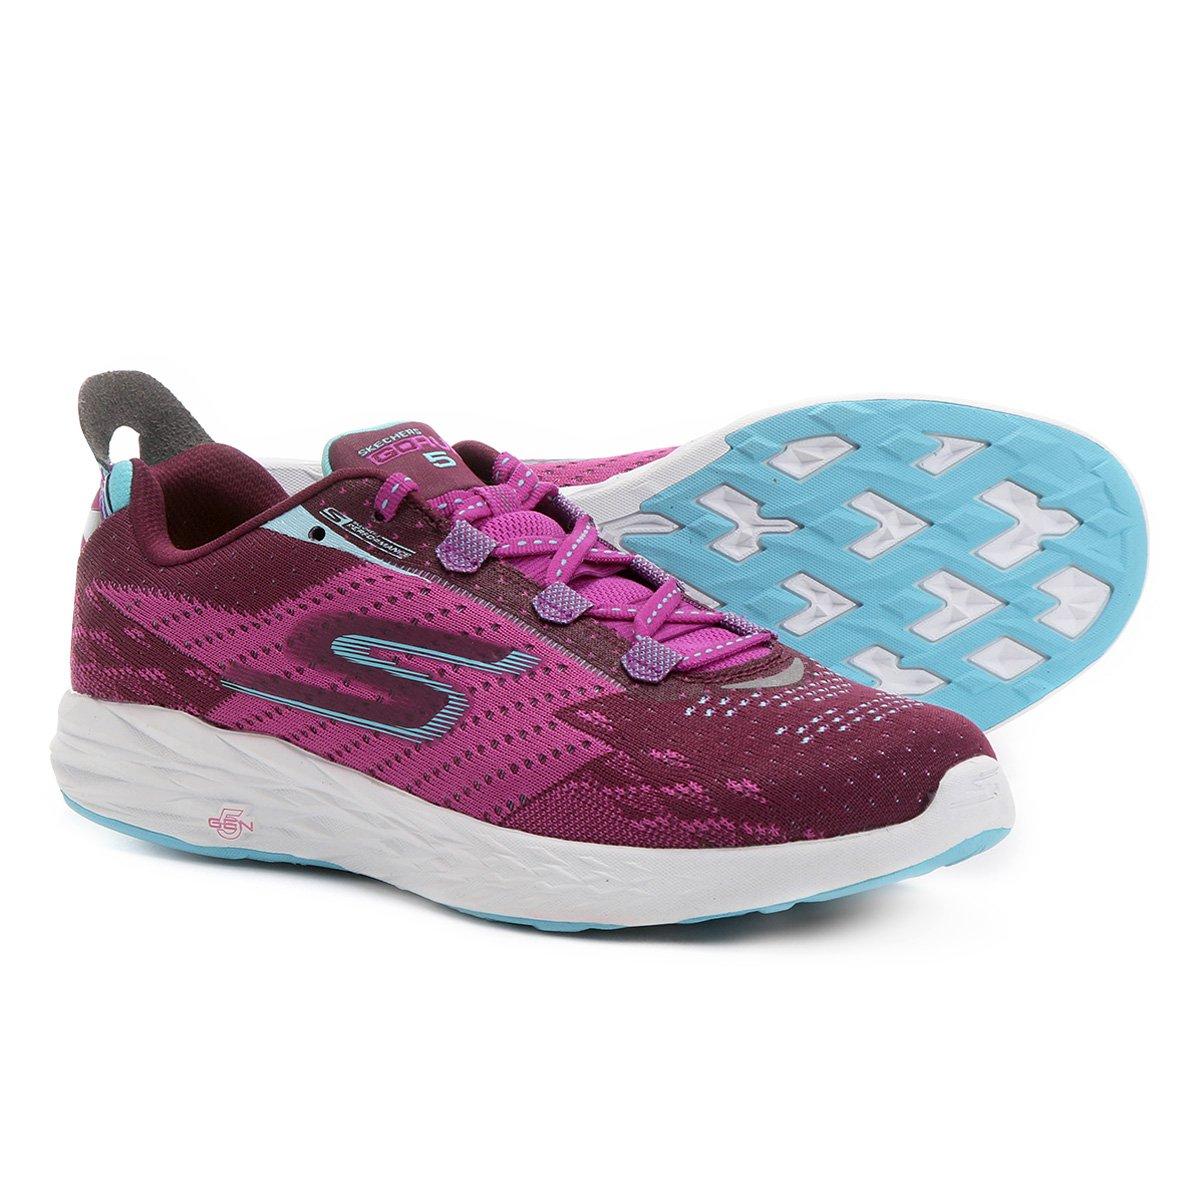 3affeac1c Tênis Skechers Go Run 5 Feminino